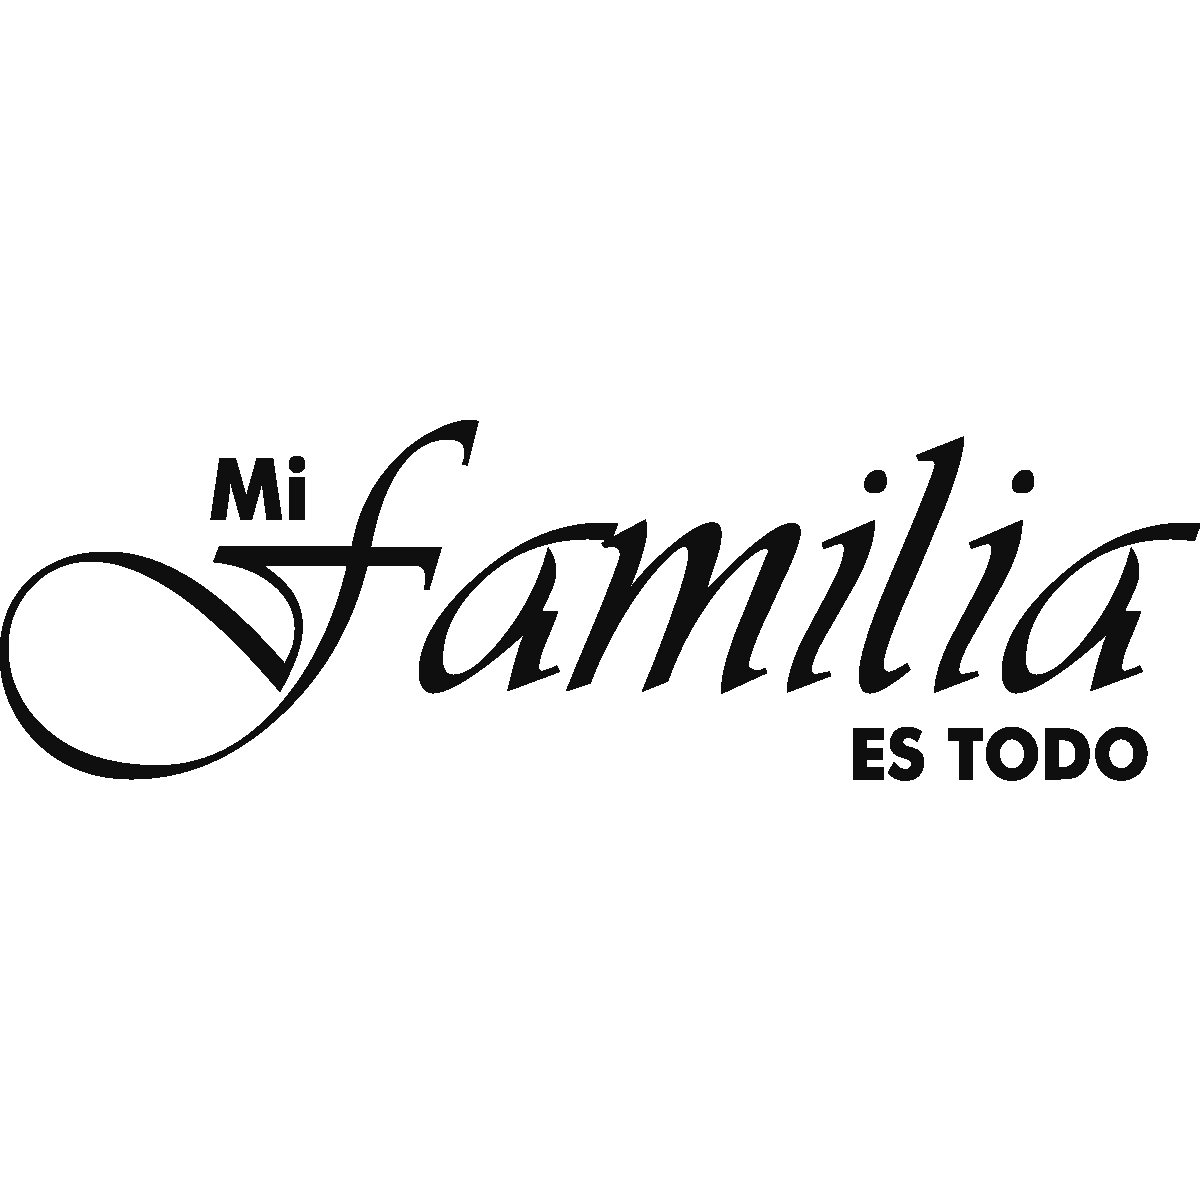 Sticker Citation Espagnol - Mi familia es todo